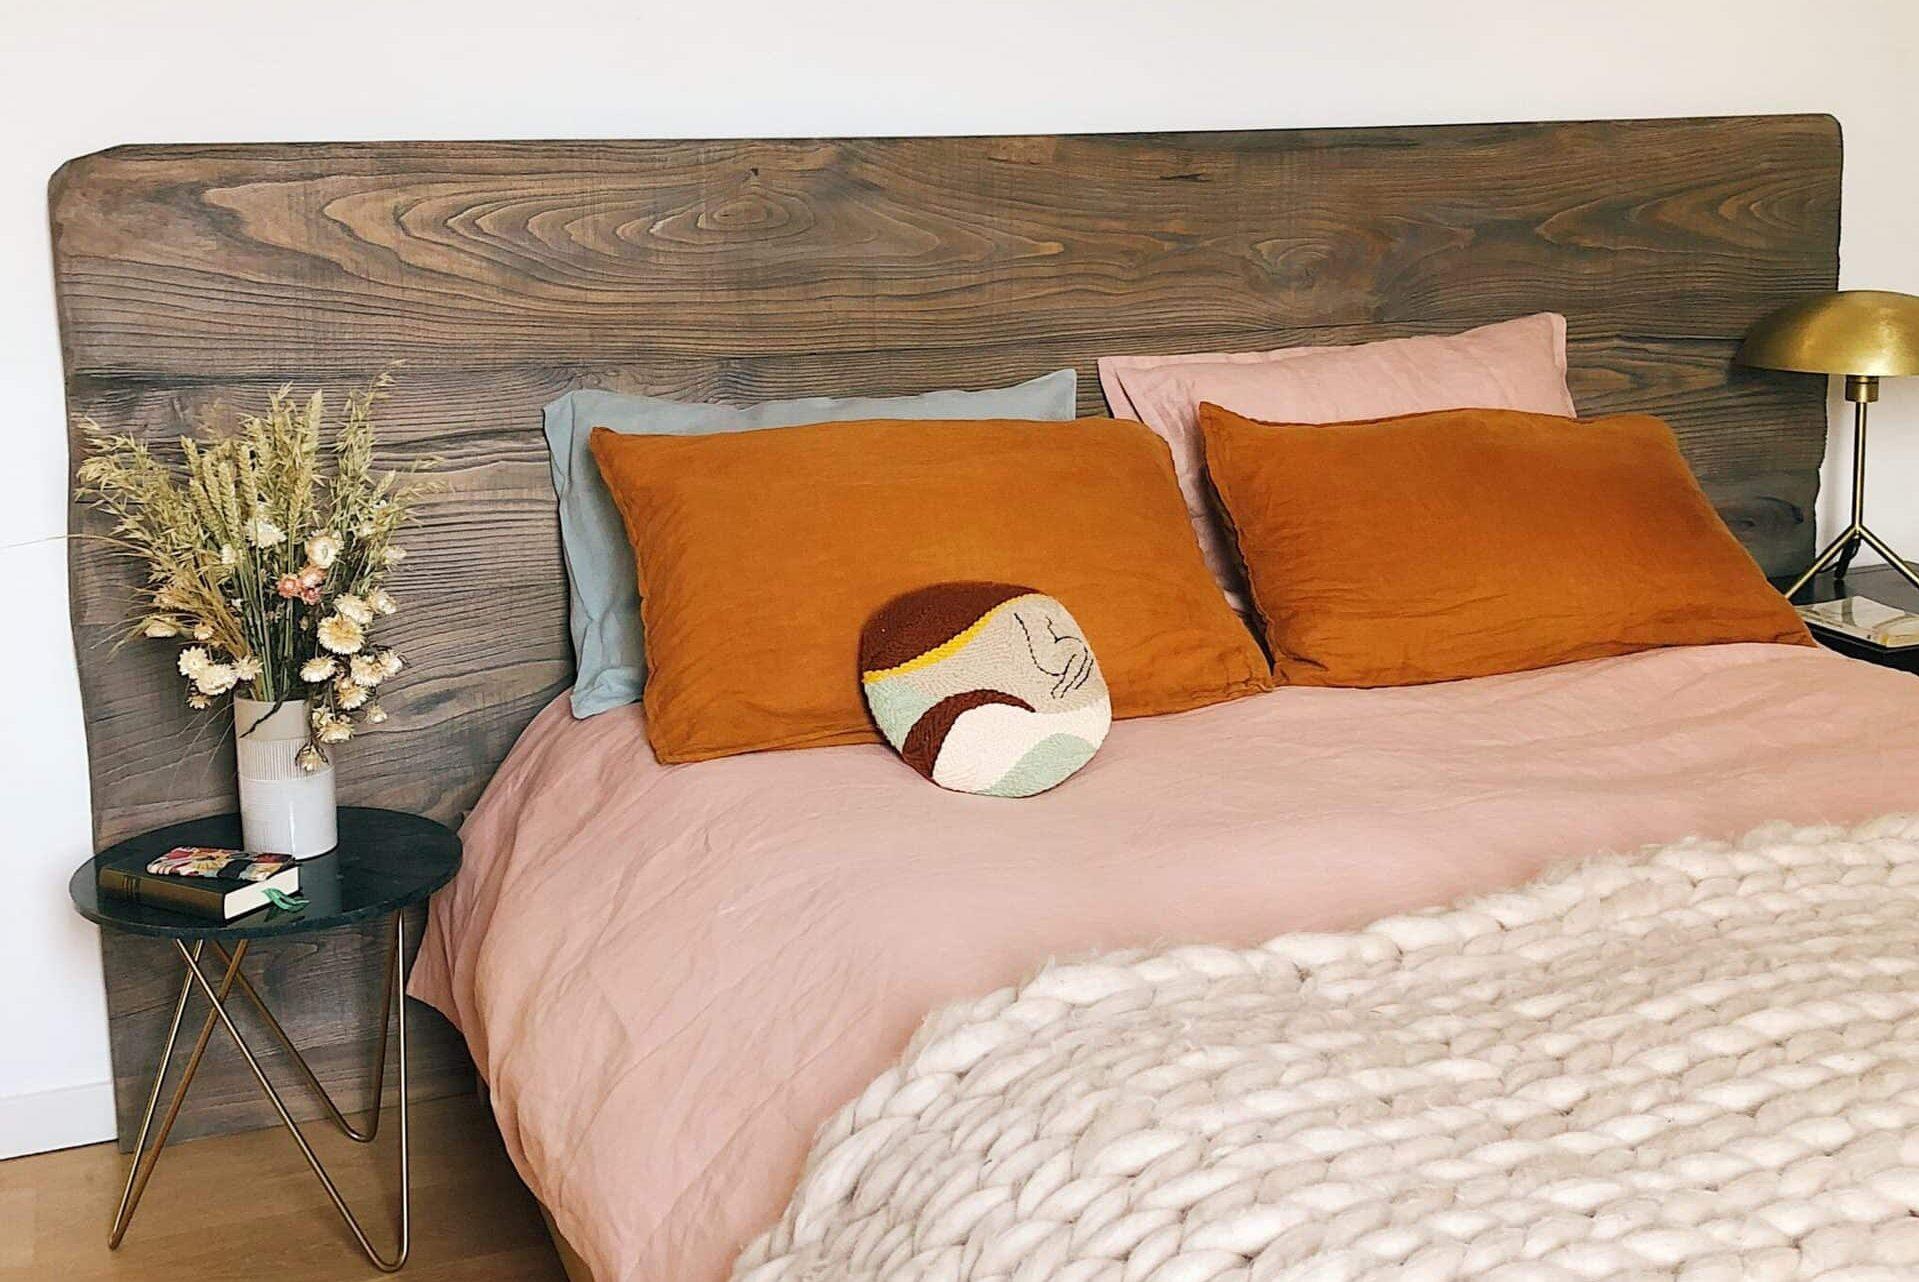 Reclaimed wood bedframe